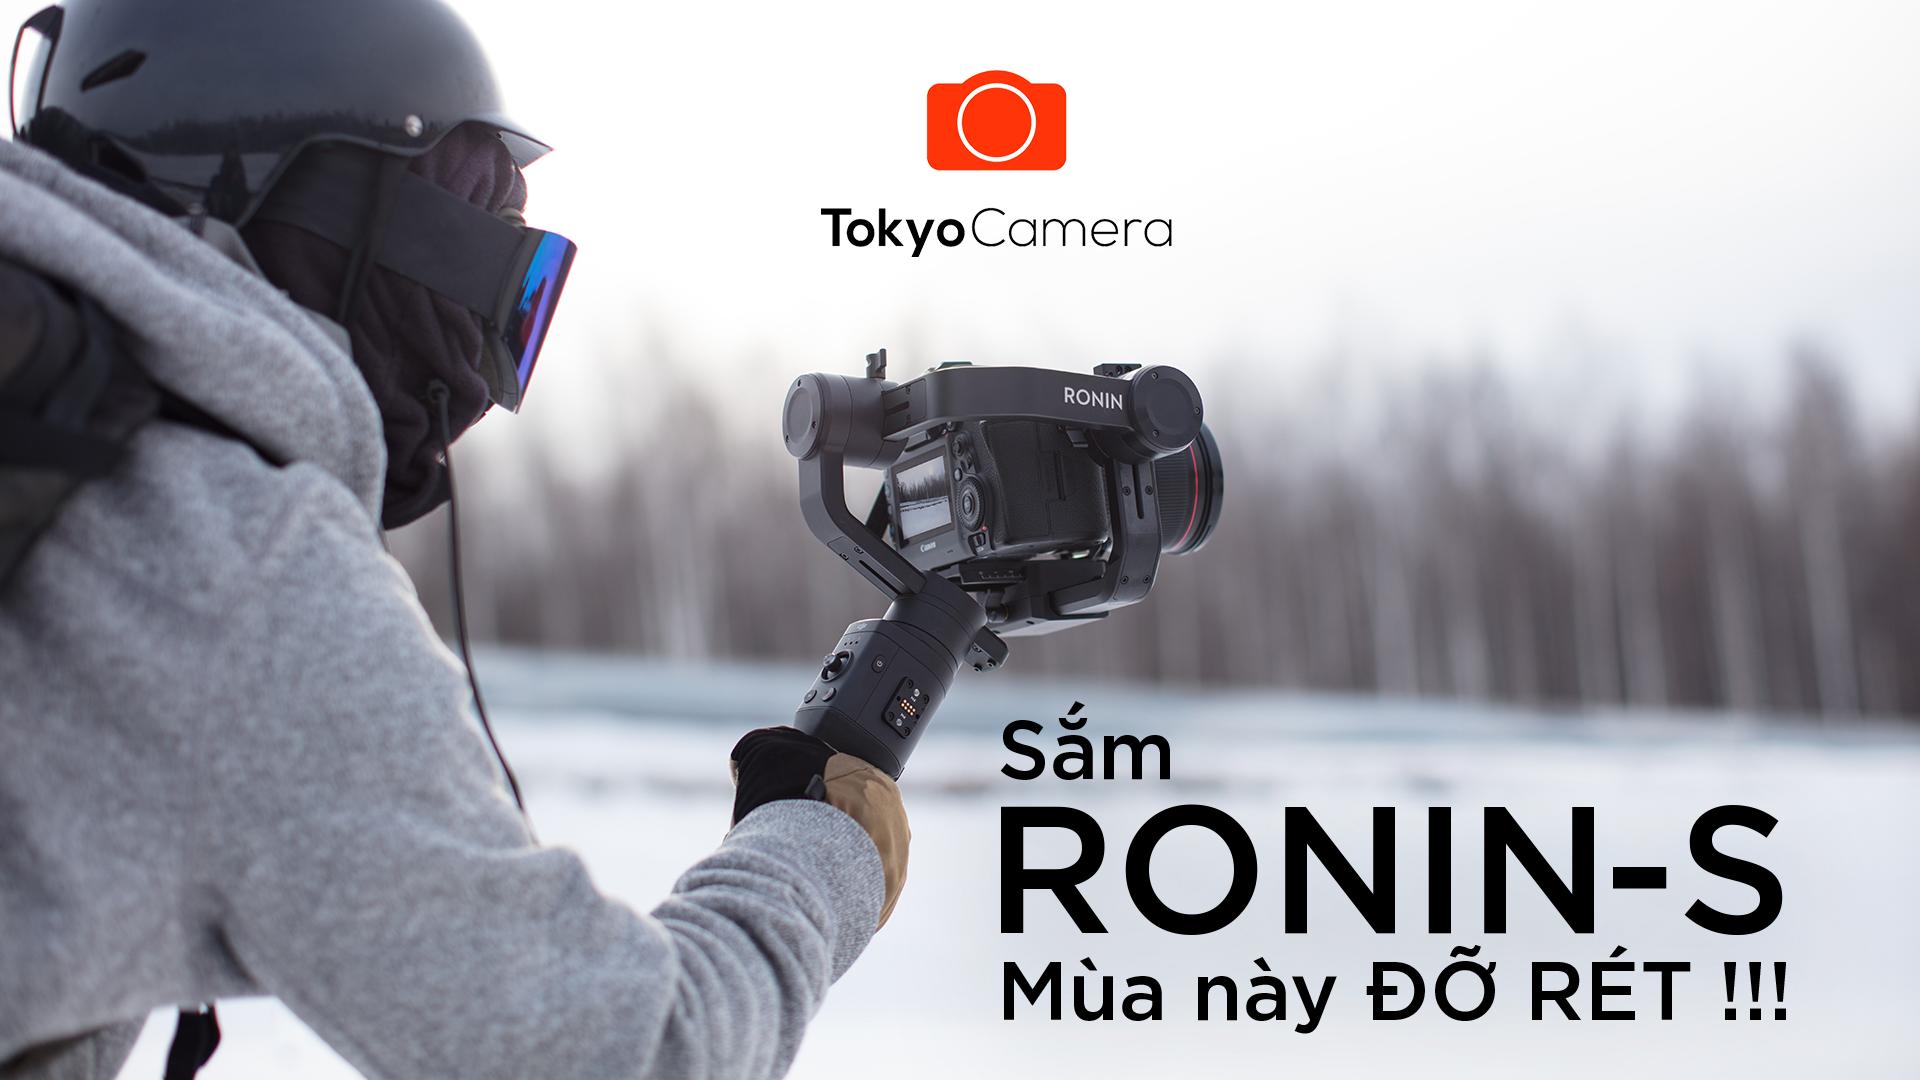 Sam Ronin S - Mua nay do ret - 1920x1080